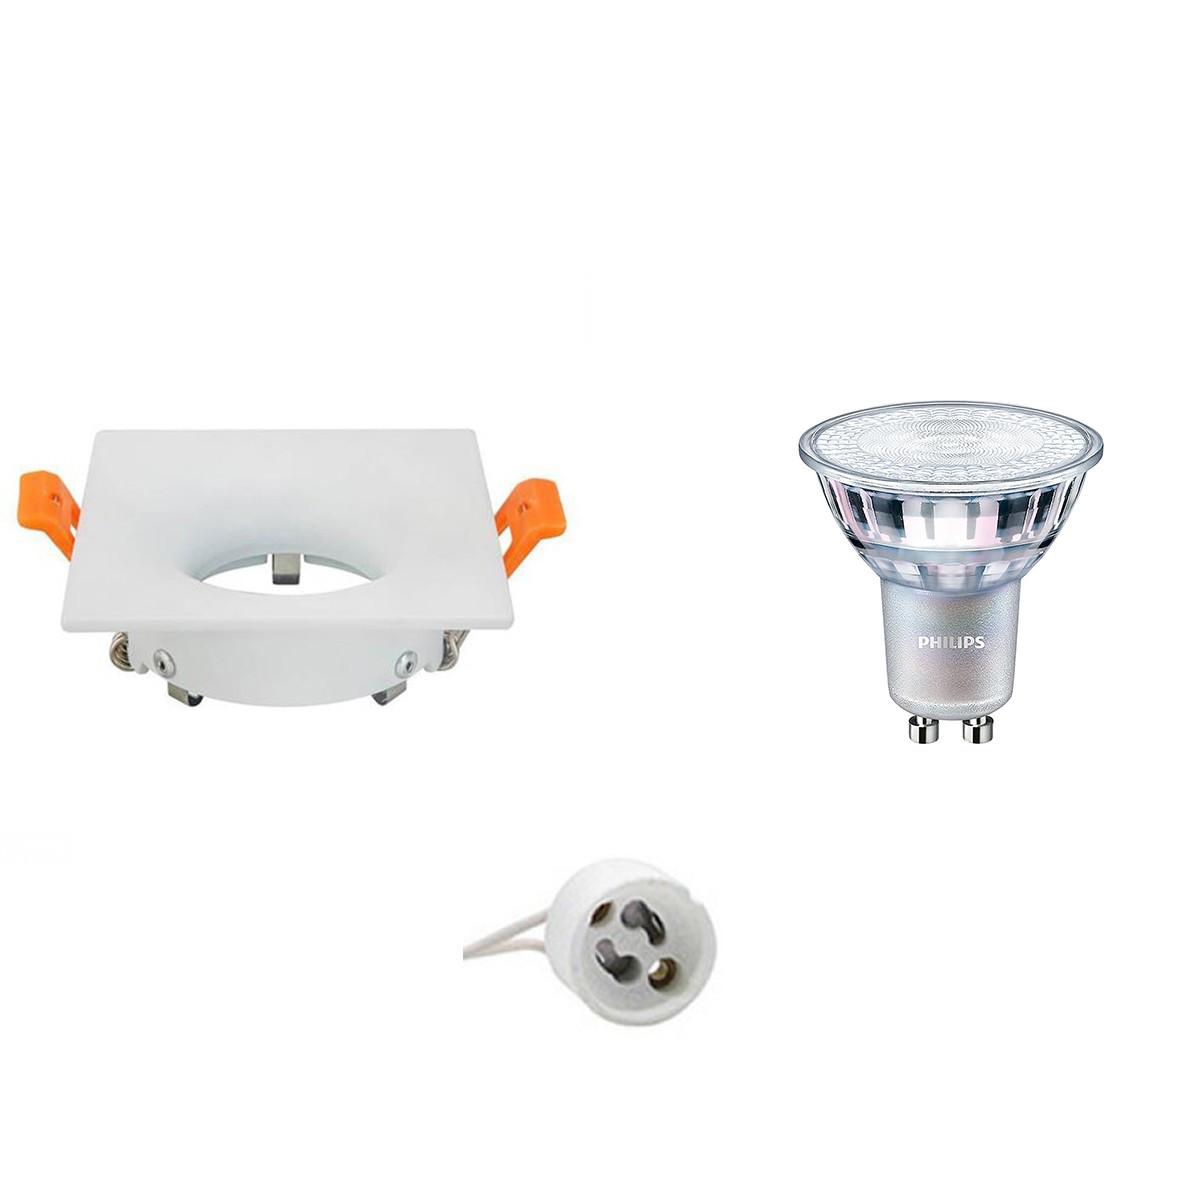 PHILIPS - LED Spot Set - MASTER 927 36D VLE - GU10 Fitting - DimTone Dimbaar - Inbouw Vierkant - Mat